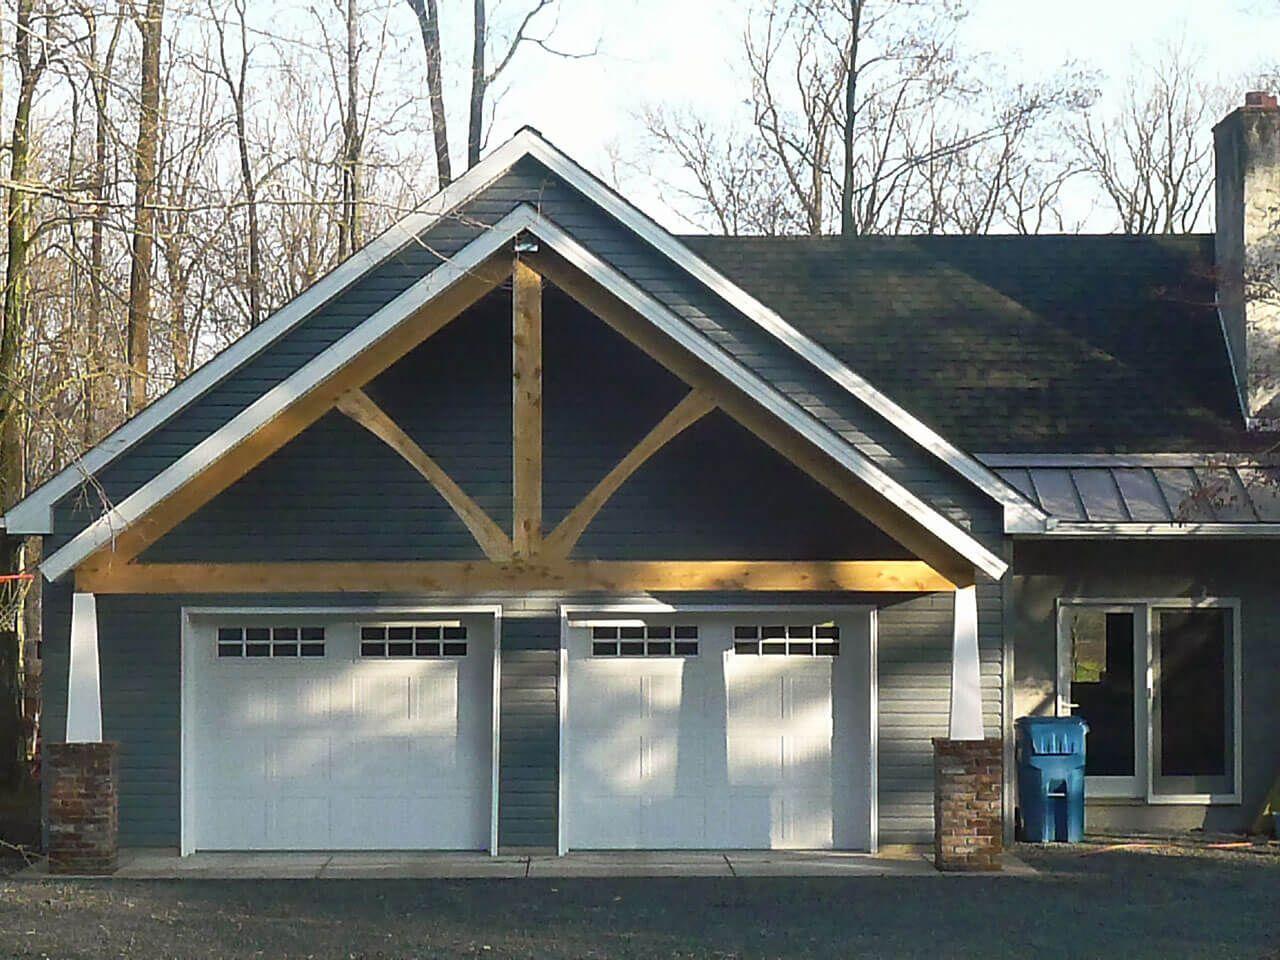 Attached Garage Addition 2 Car Garage Custom Addition Garage Addition Custom Garages Roof Design